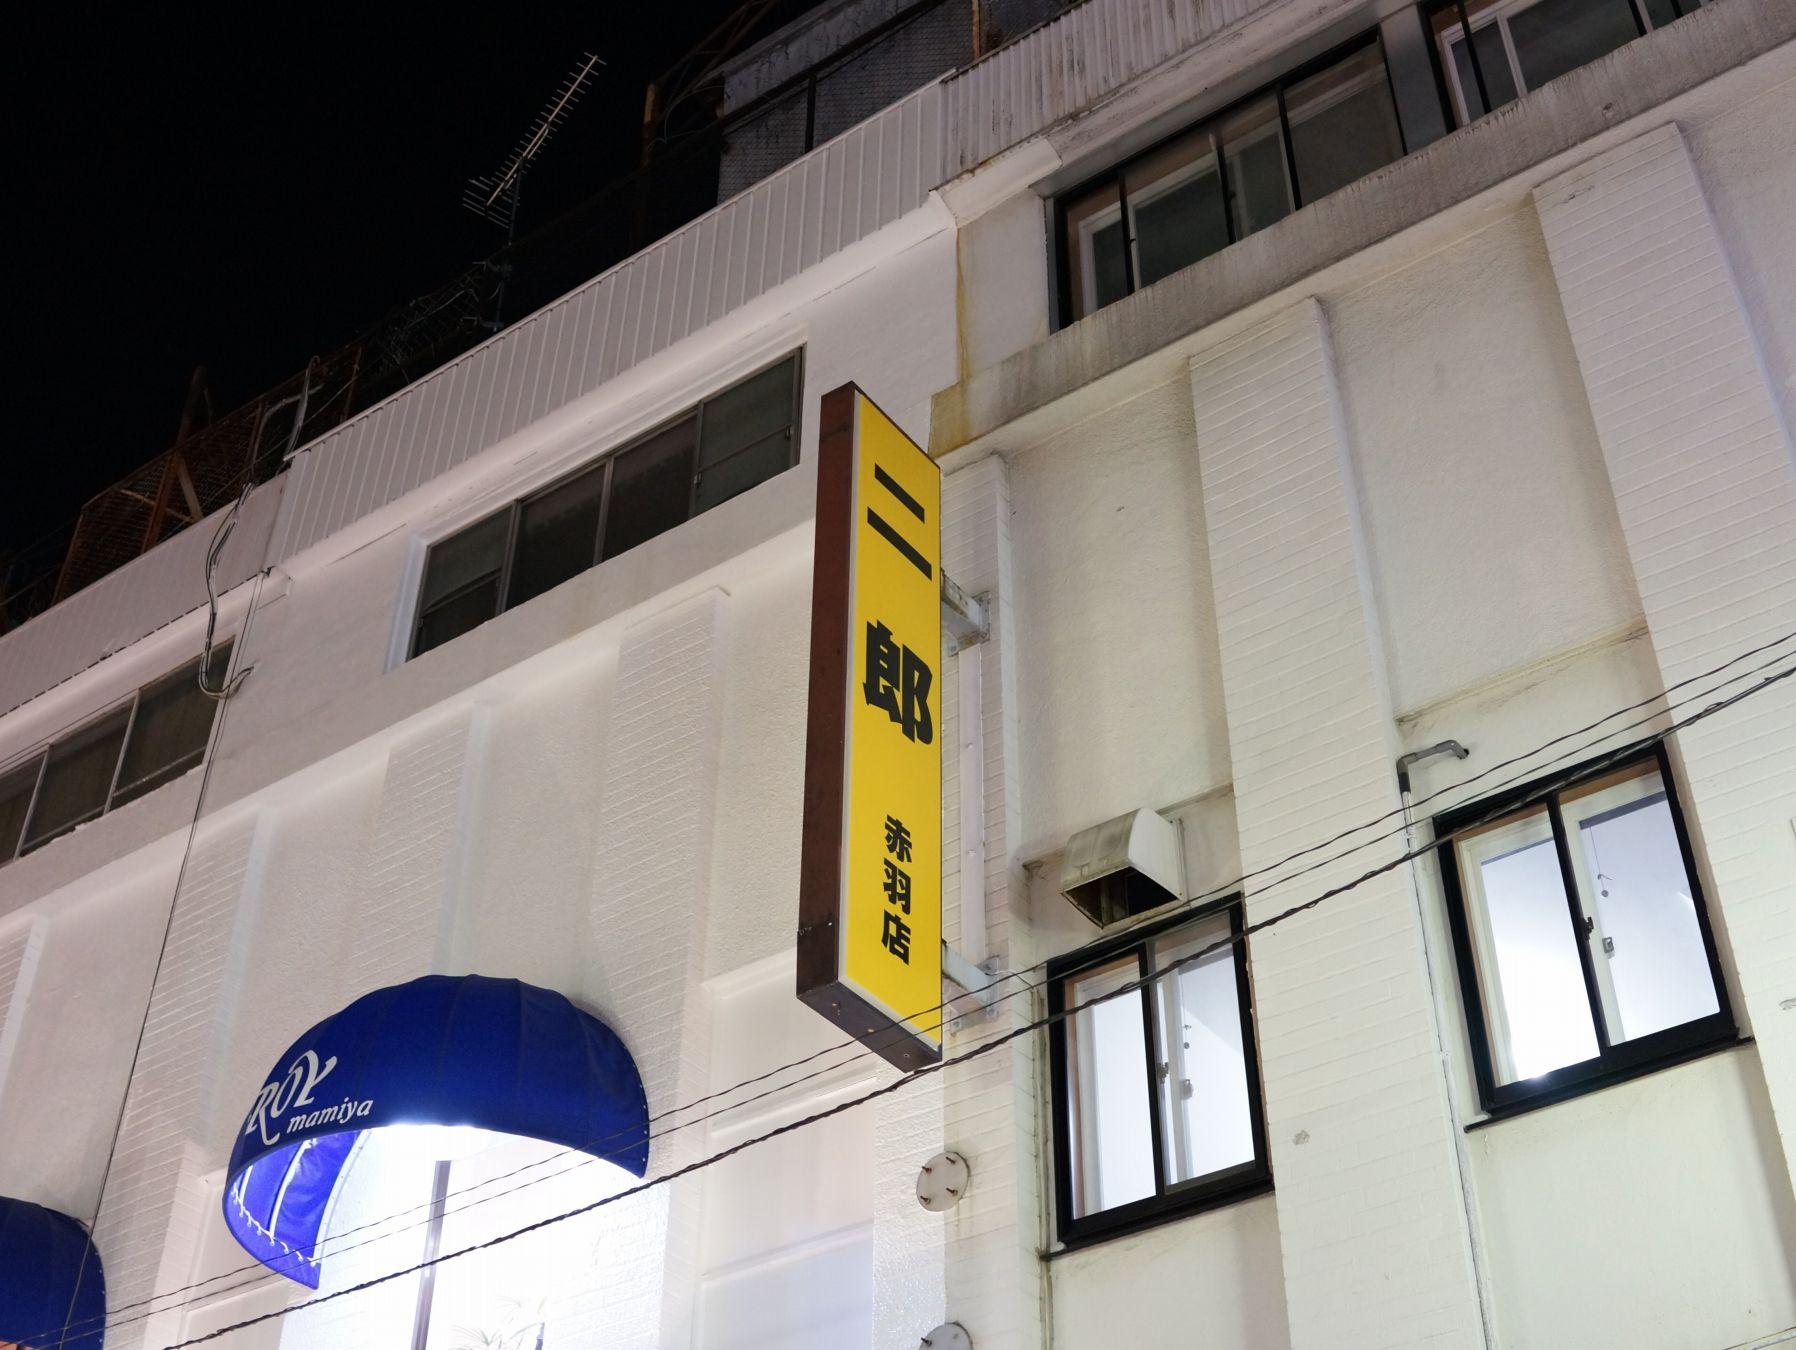 20121214001akabane.jpg